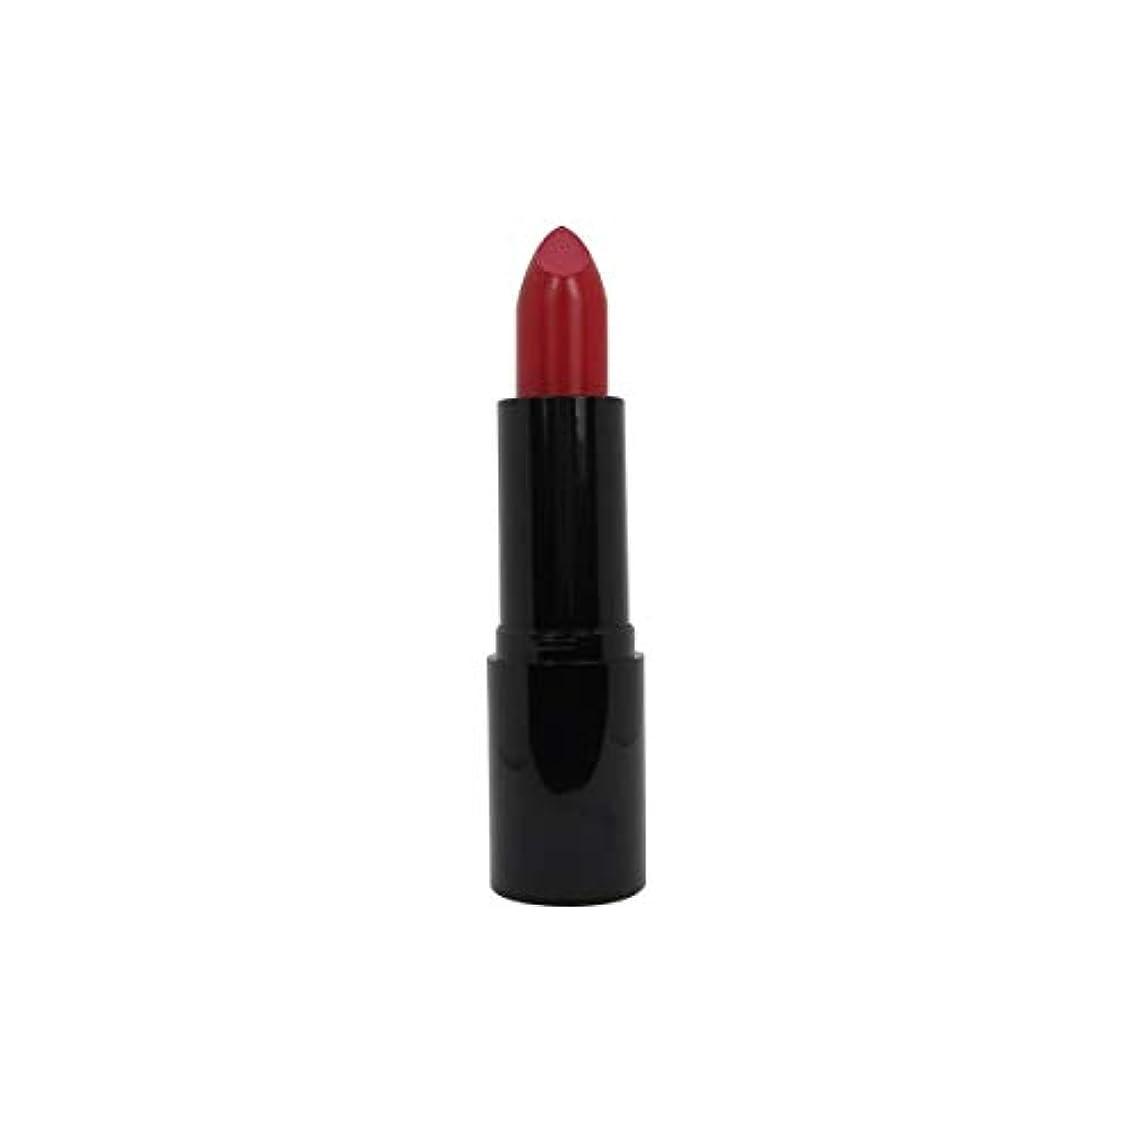 仮装仕様矩形Skinerie The Collection Lipstick 08 Cherry on Top 3,5g